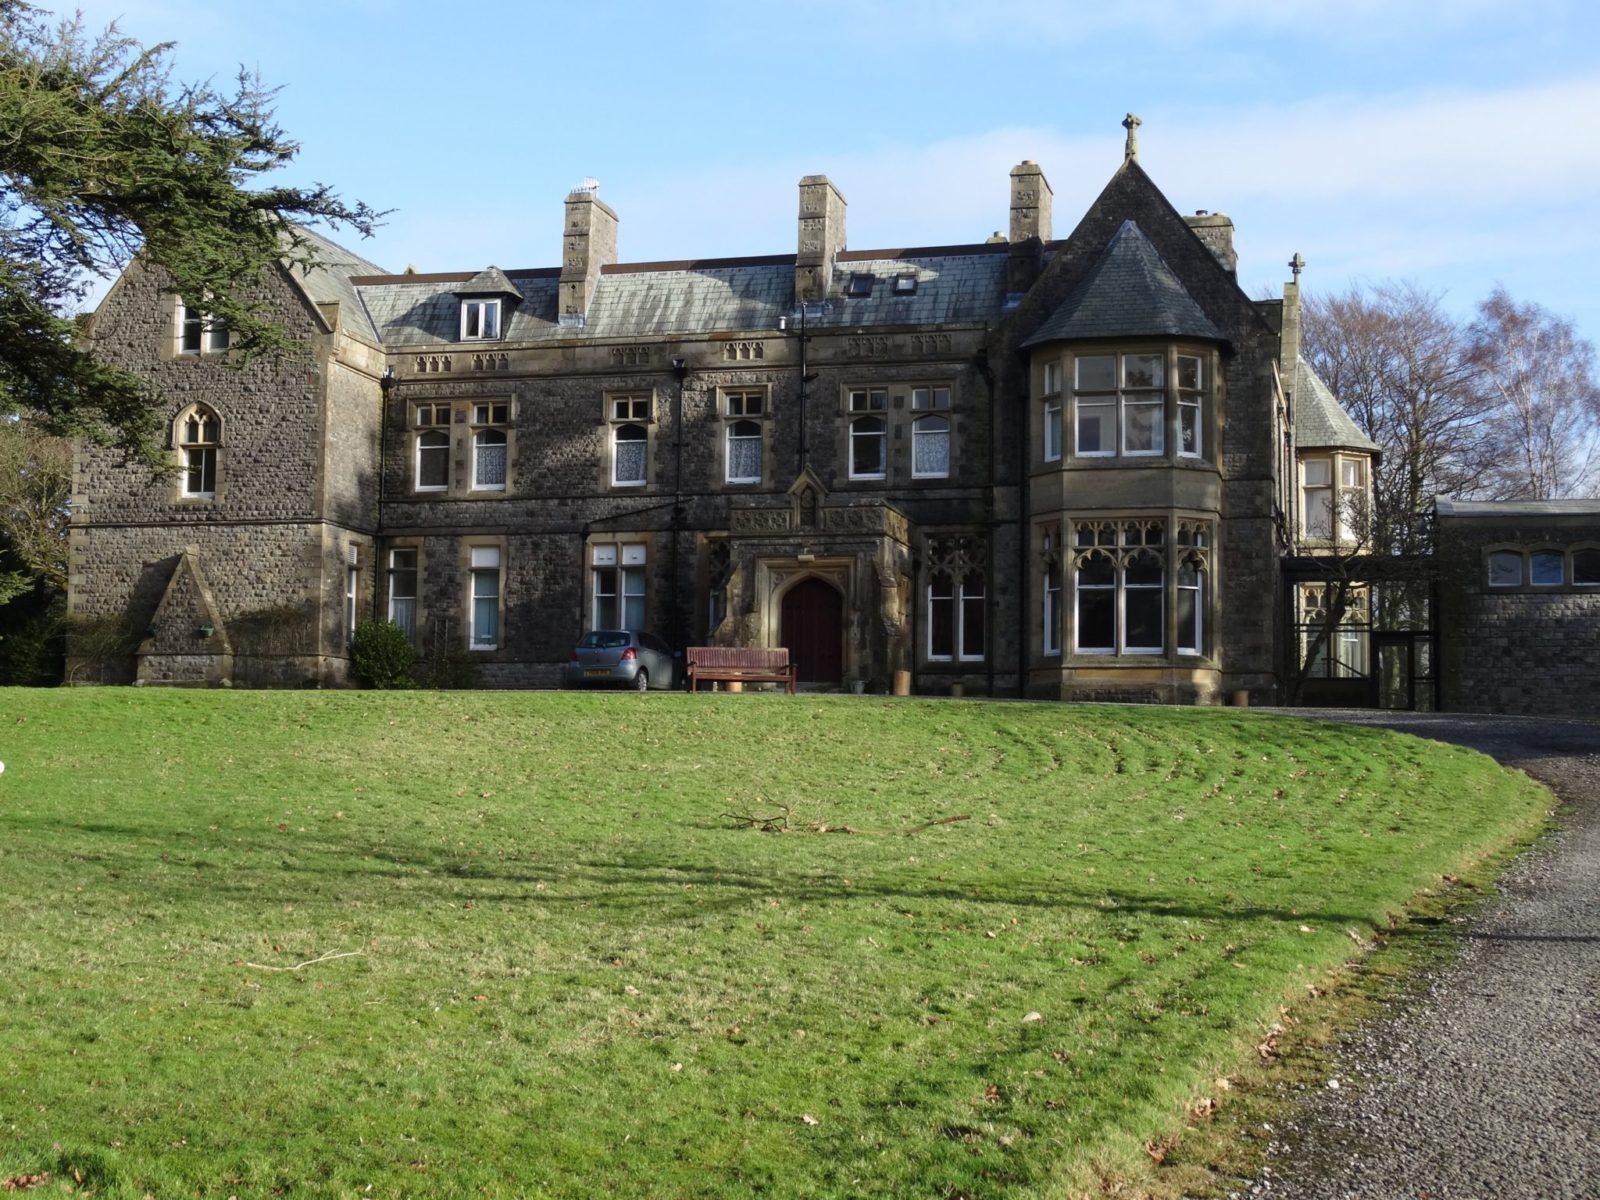 Brettargh Holt